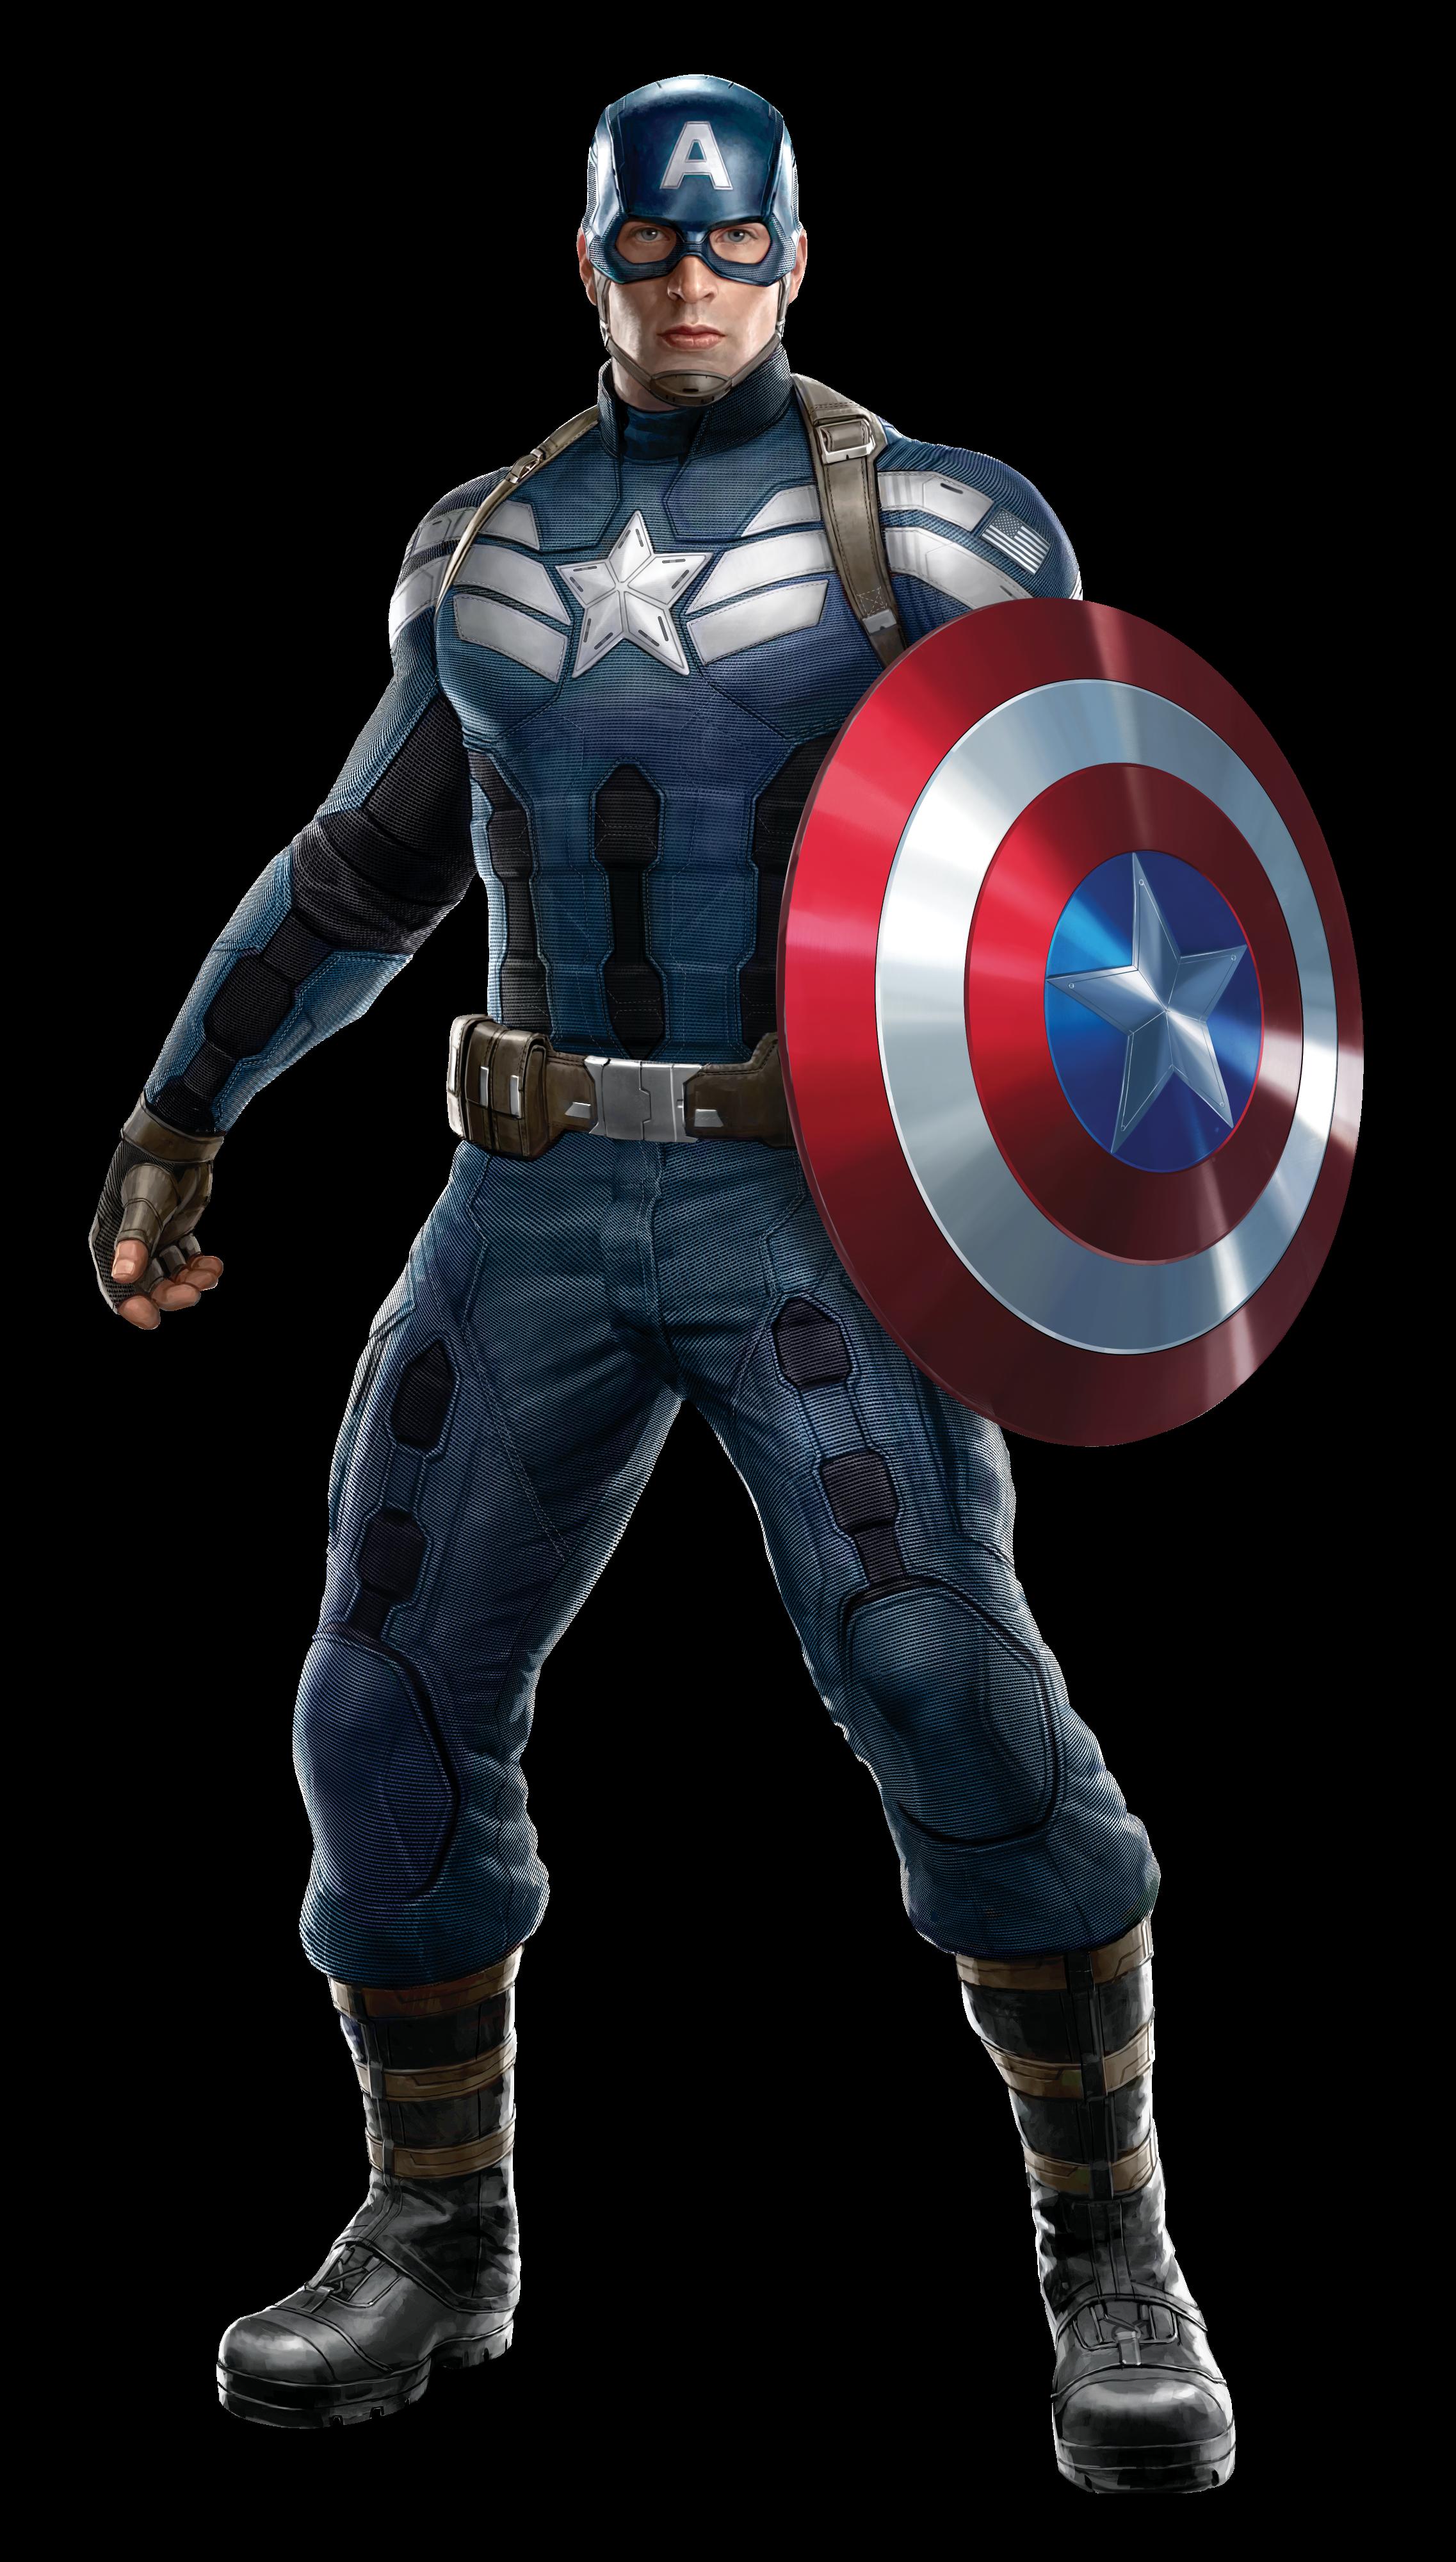 Captain America Captain America Costume Captain America Captain America Wallpaper